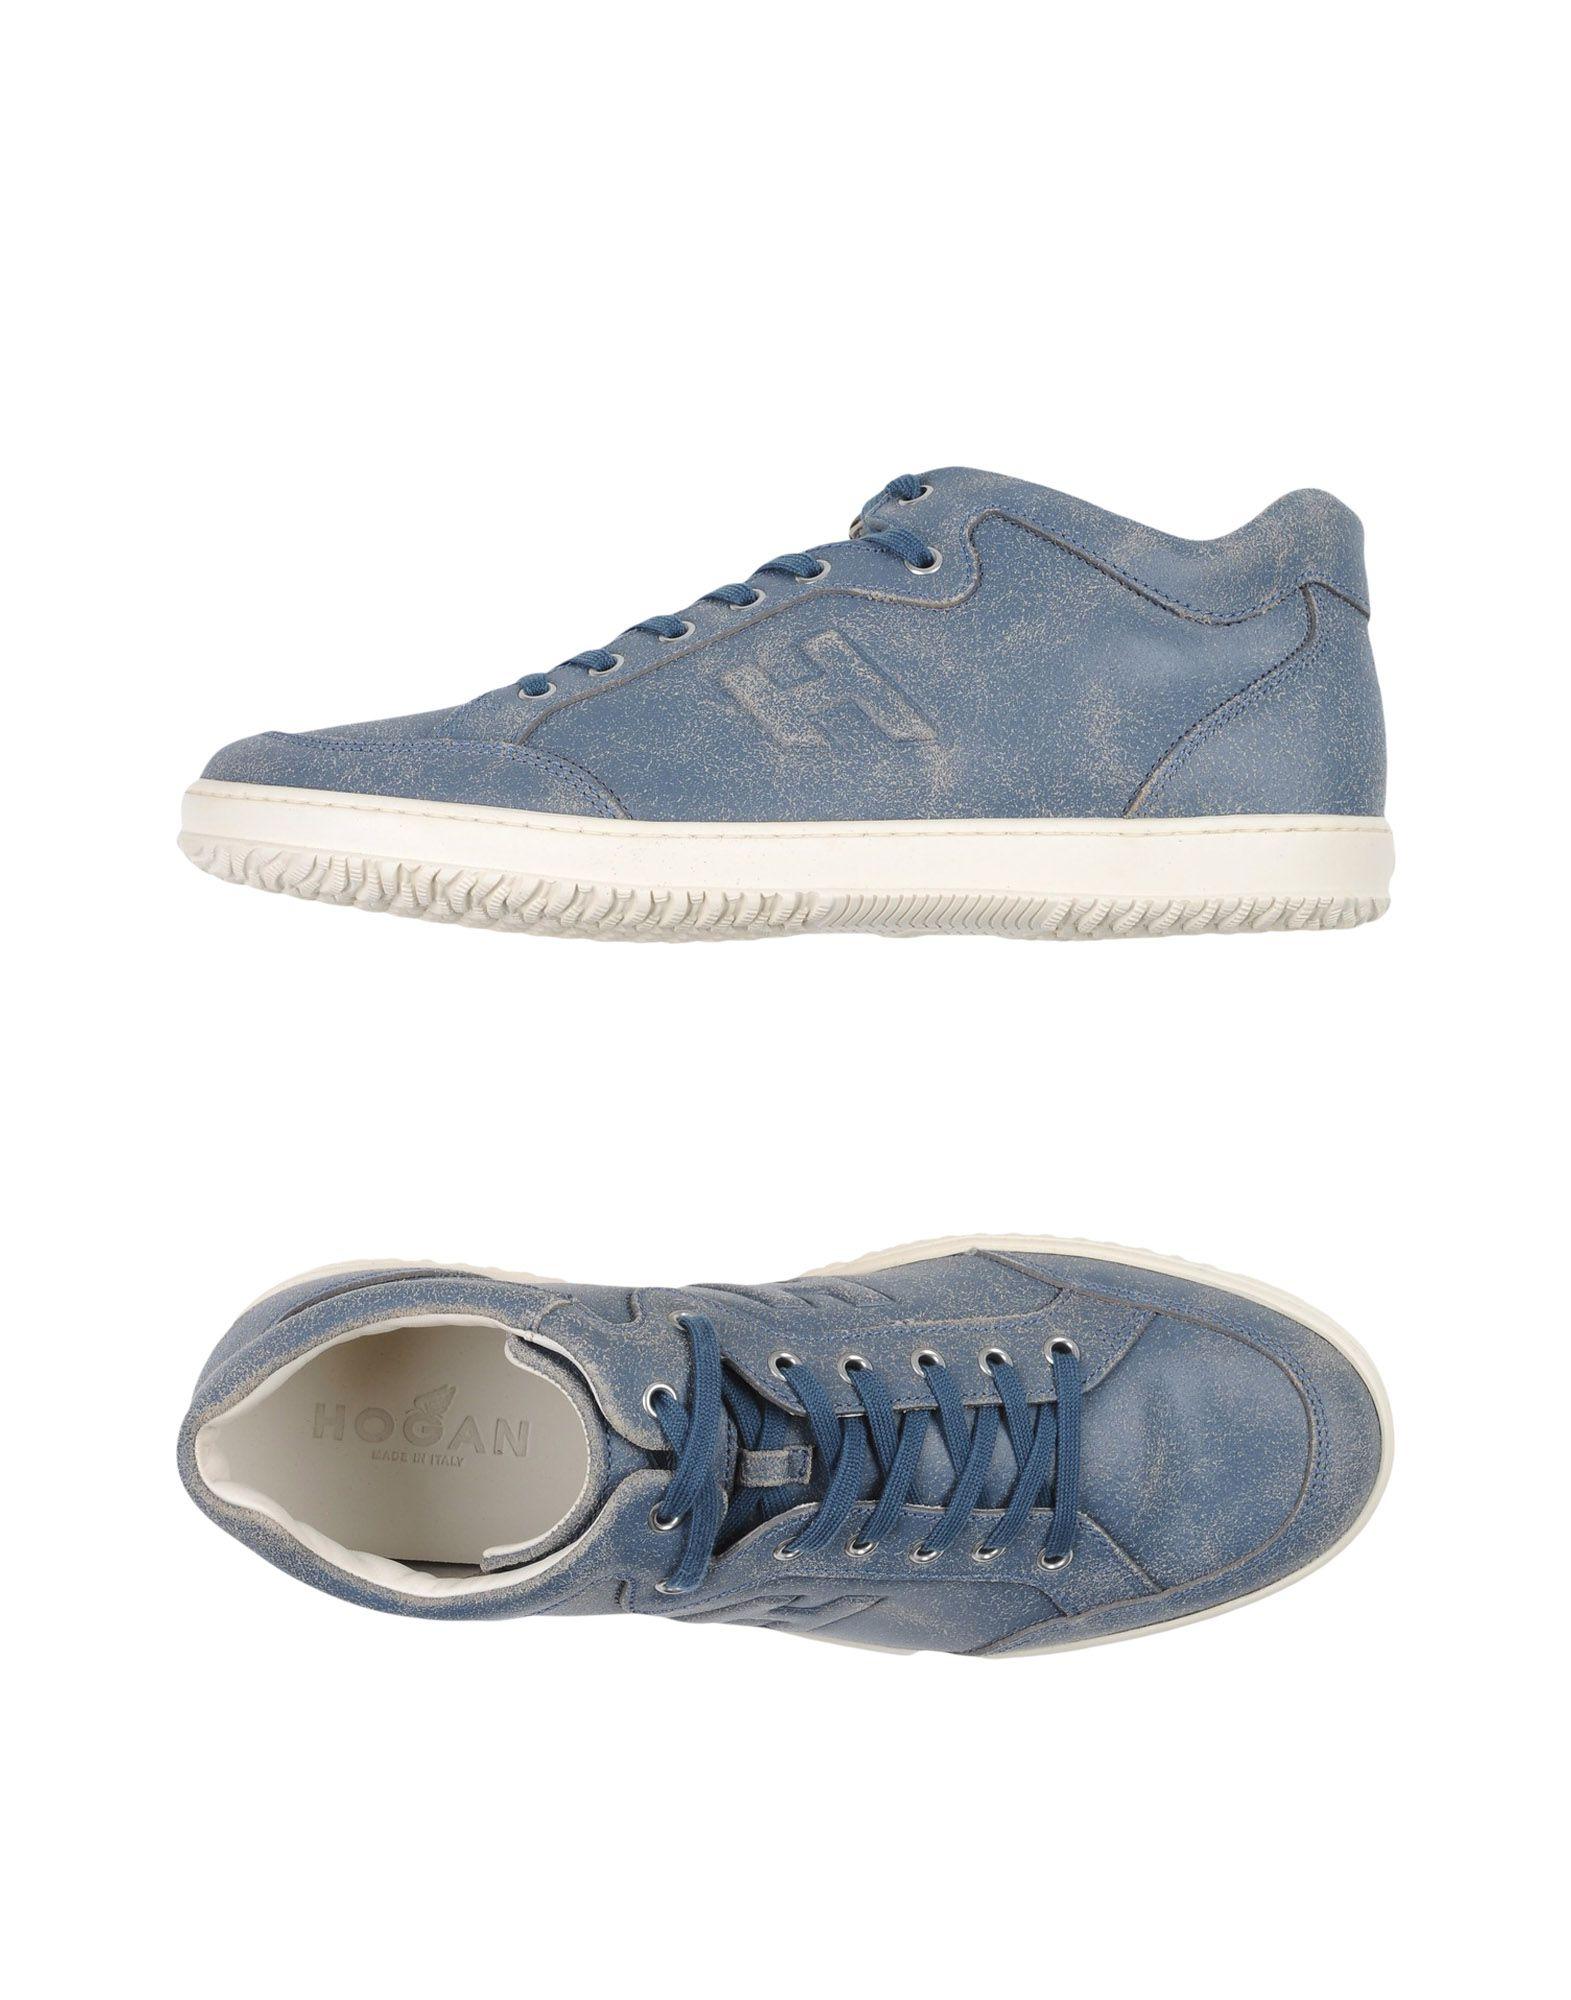 Hogan Sneakers Schuhe Herren  11335343EK Heiße Schuhe Sneakers cc5881